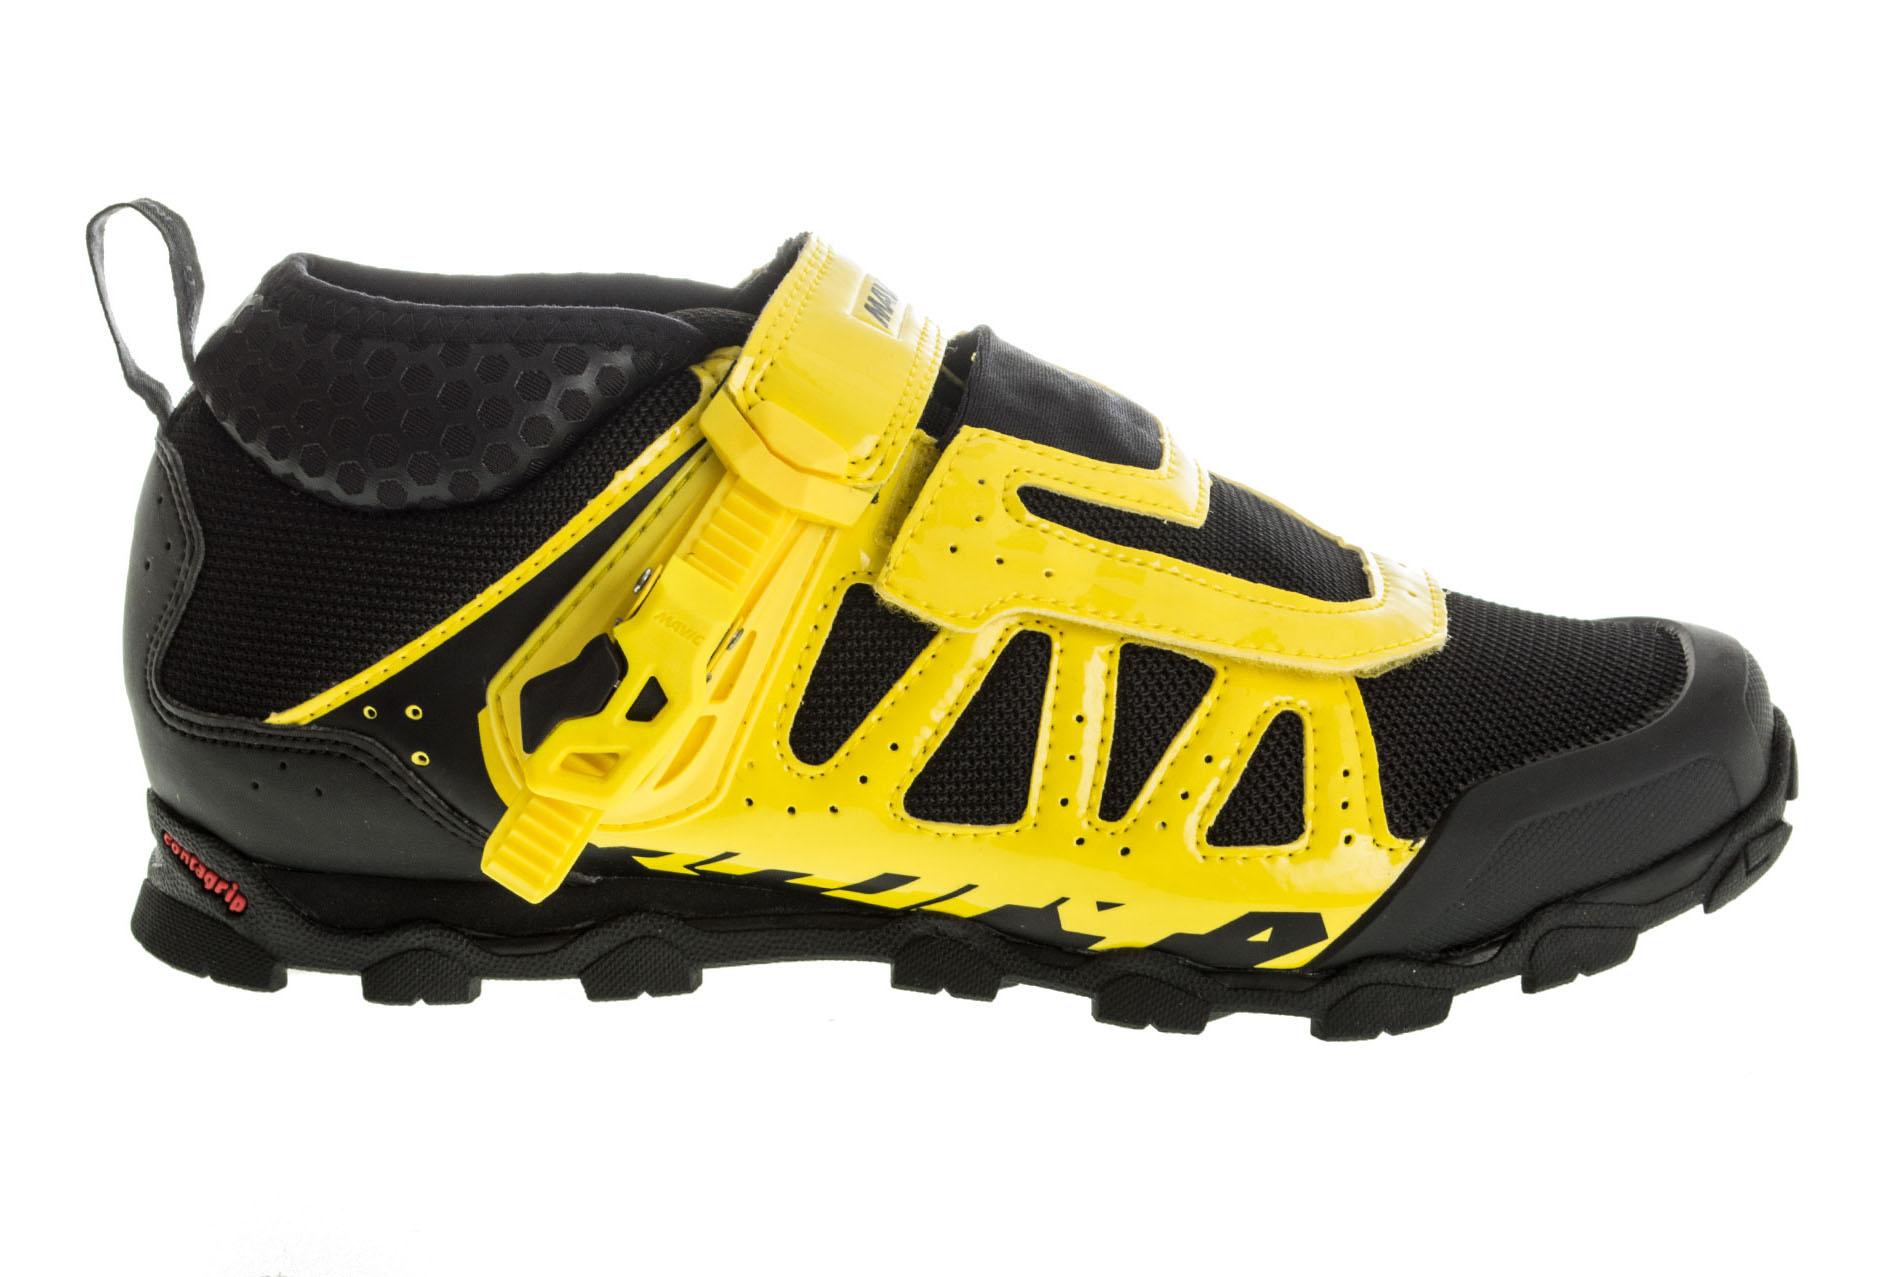 chaussures vtt mavic crossmax xl pro 2016 jaune noir. Black Bedroom Furniture Sets. Home Design Ideas